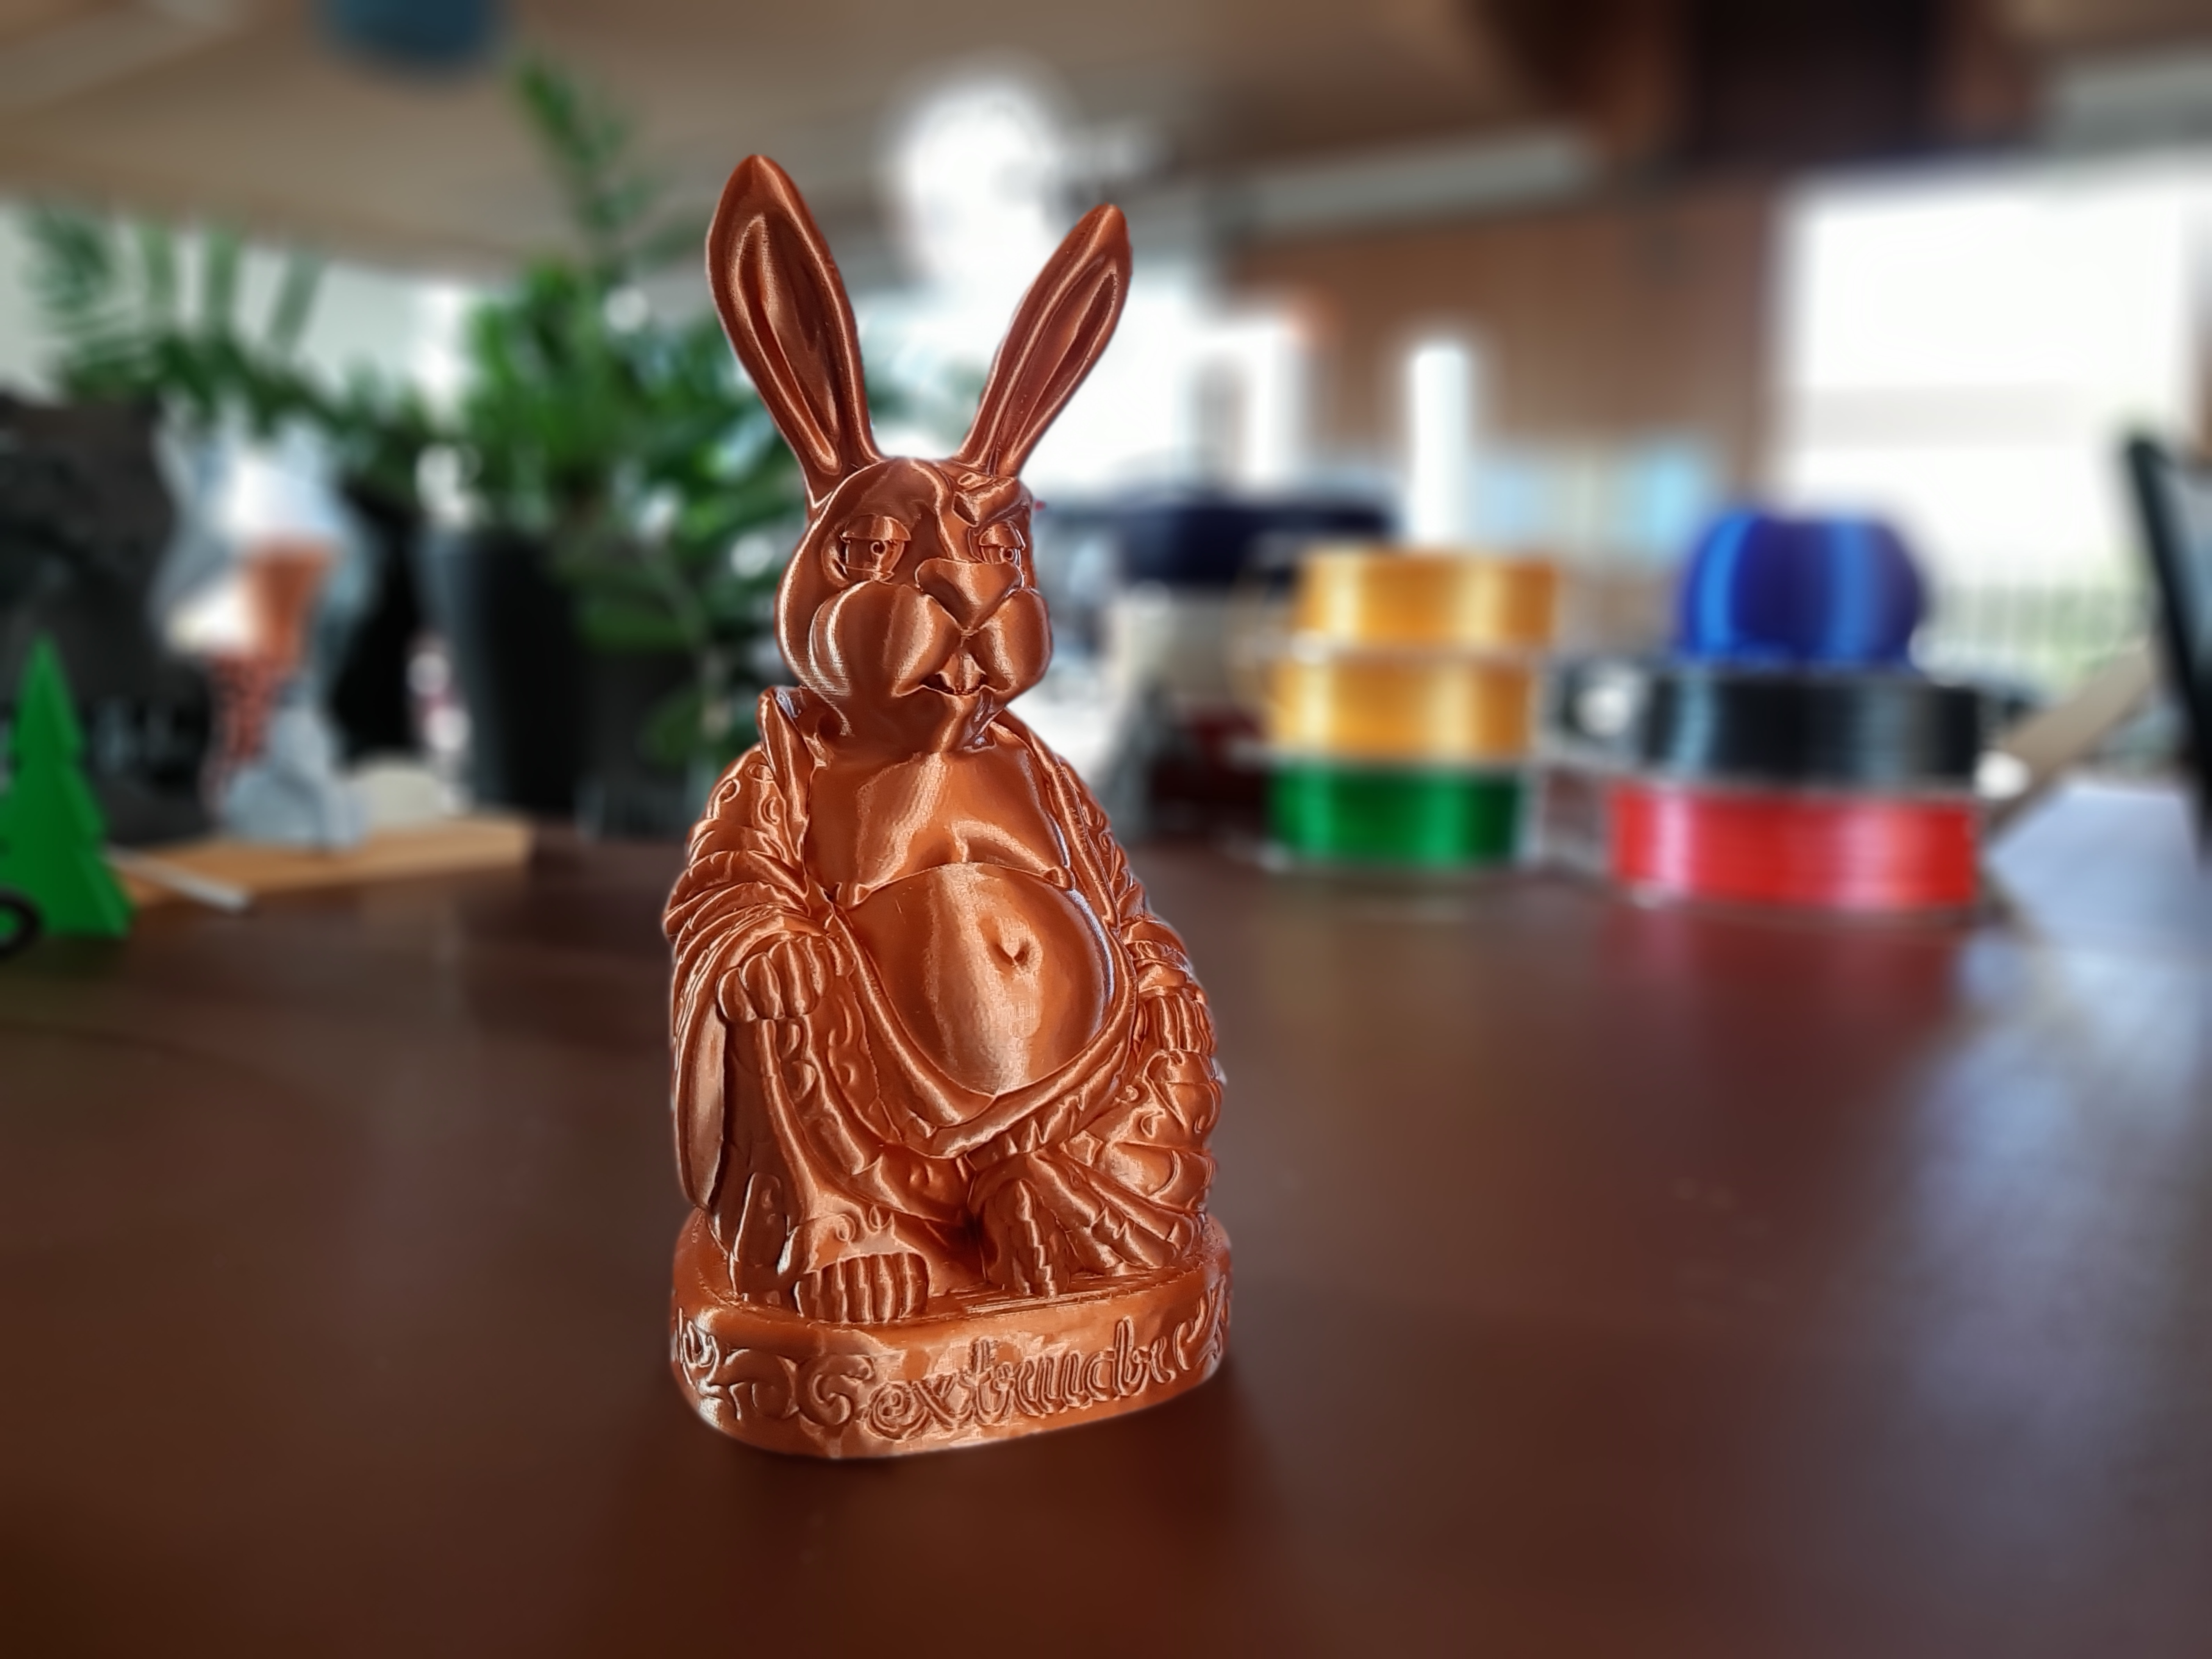 Bunny Buddha